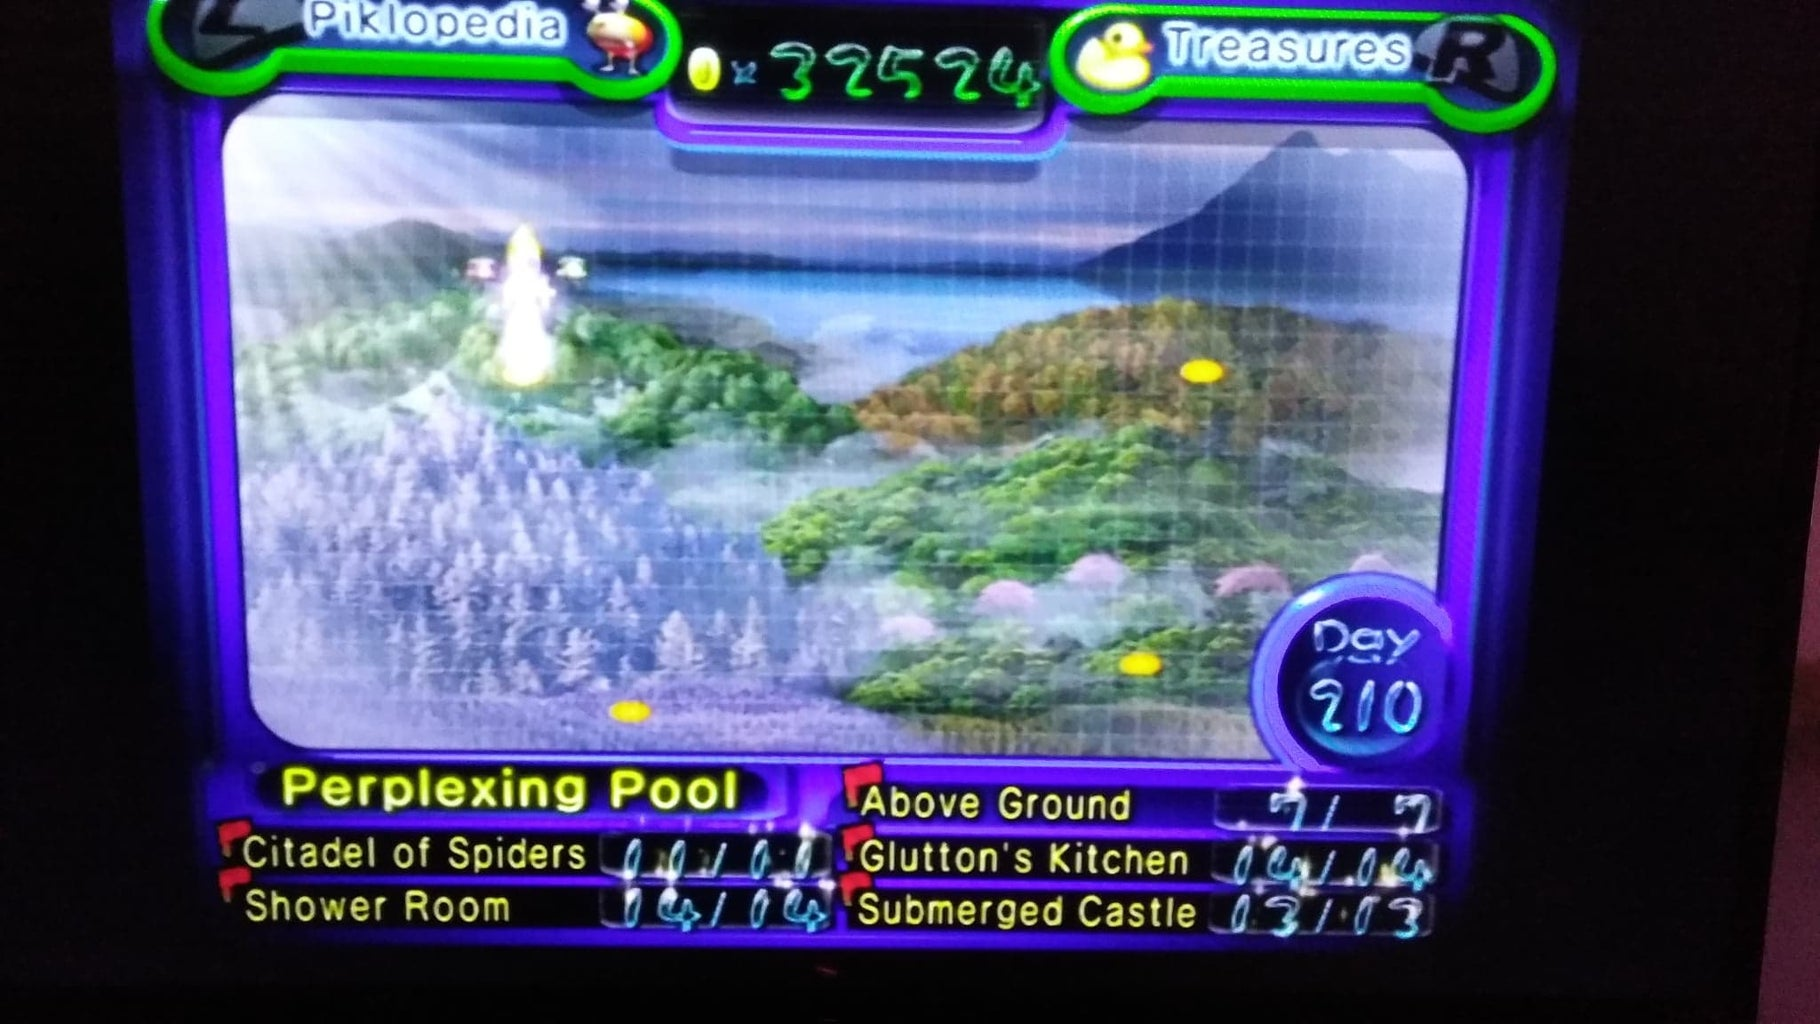 Perplexing Pool